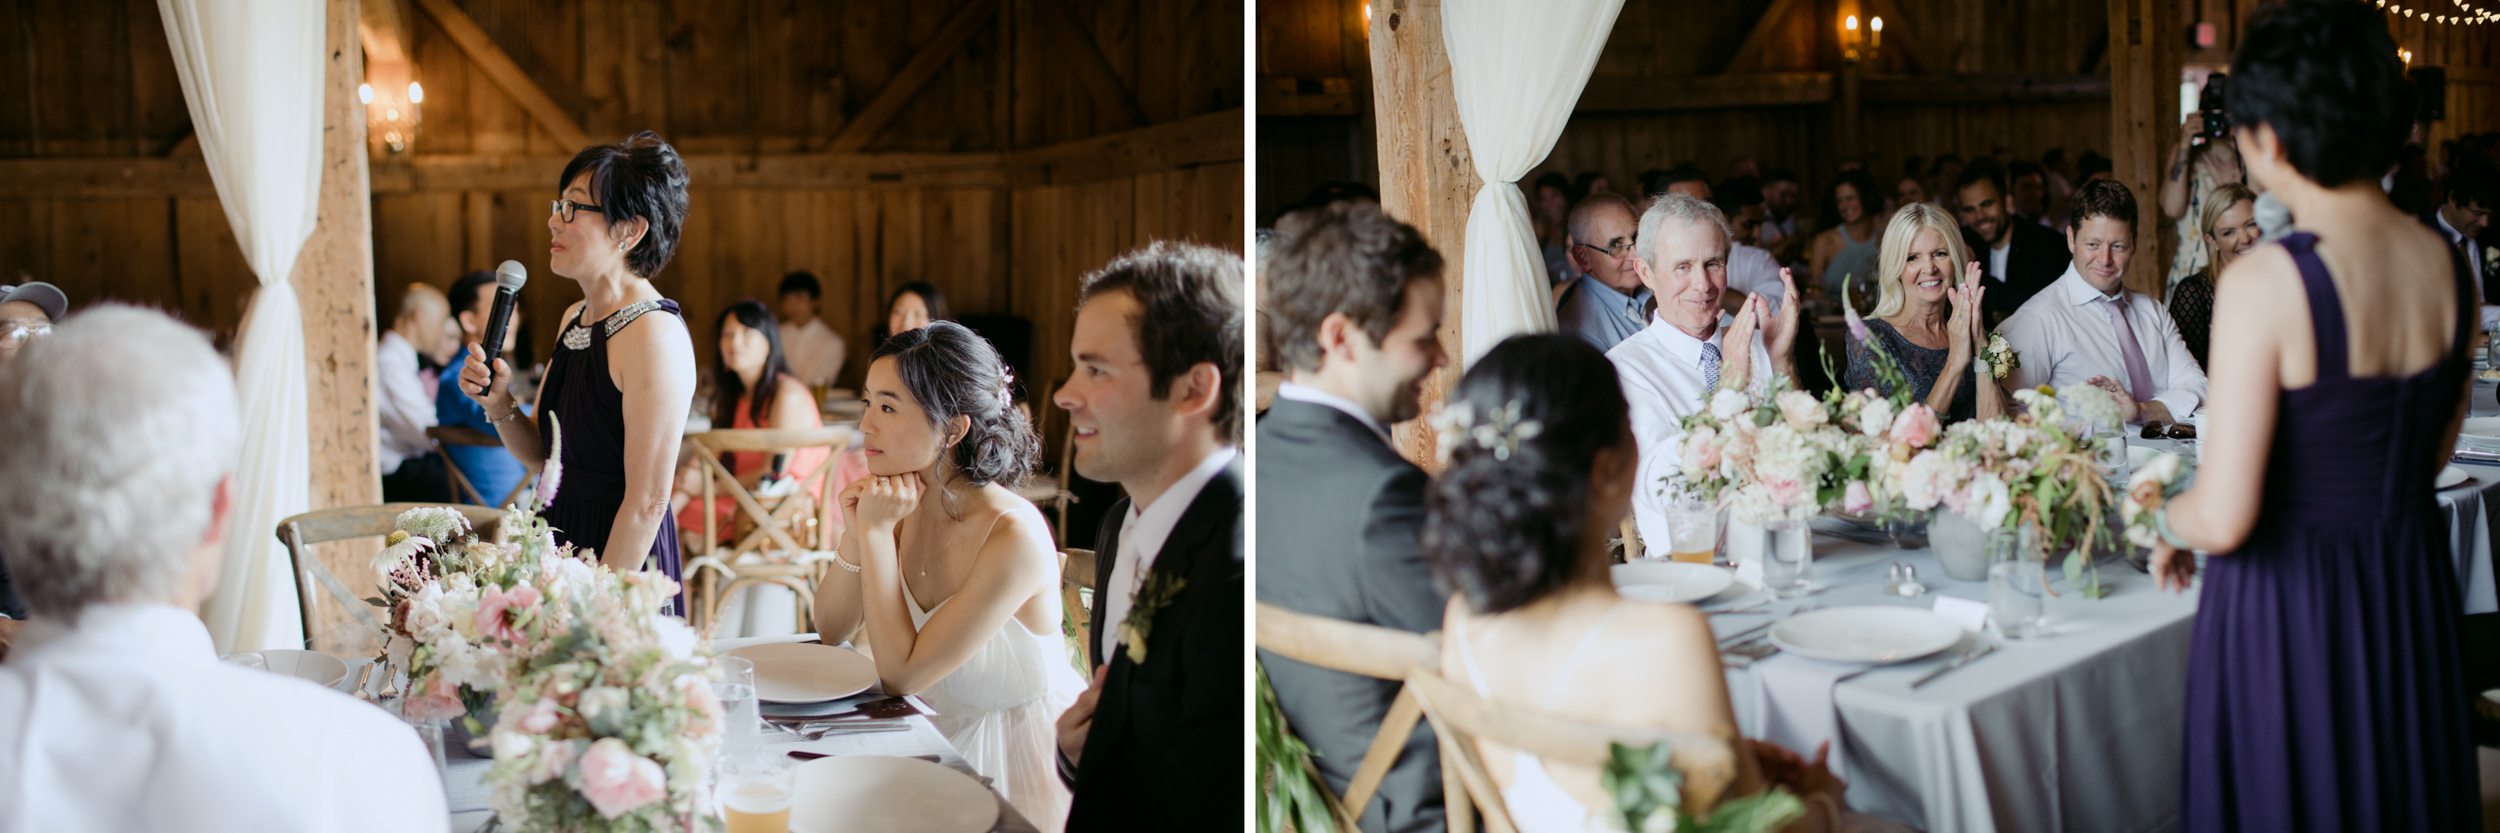 william_allen_farm_wedding_pownal_maine_ilkatayler-36.jpg